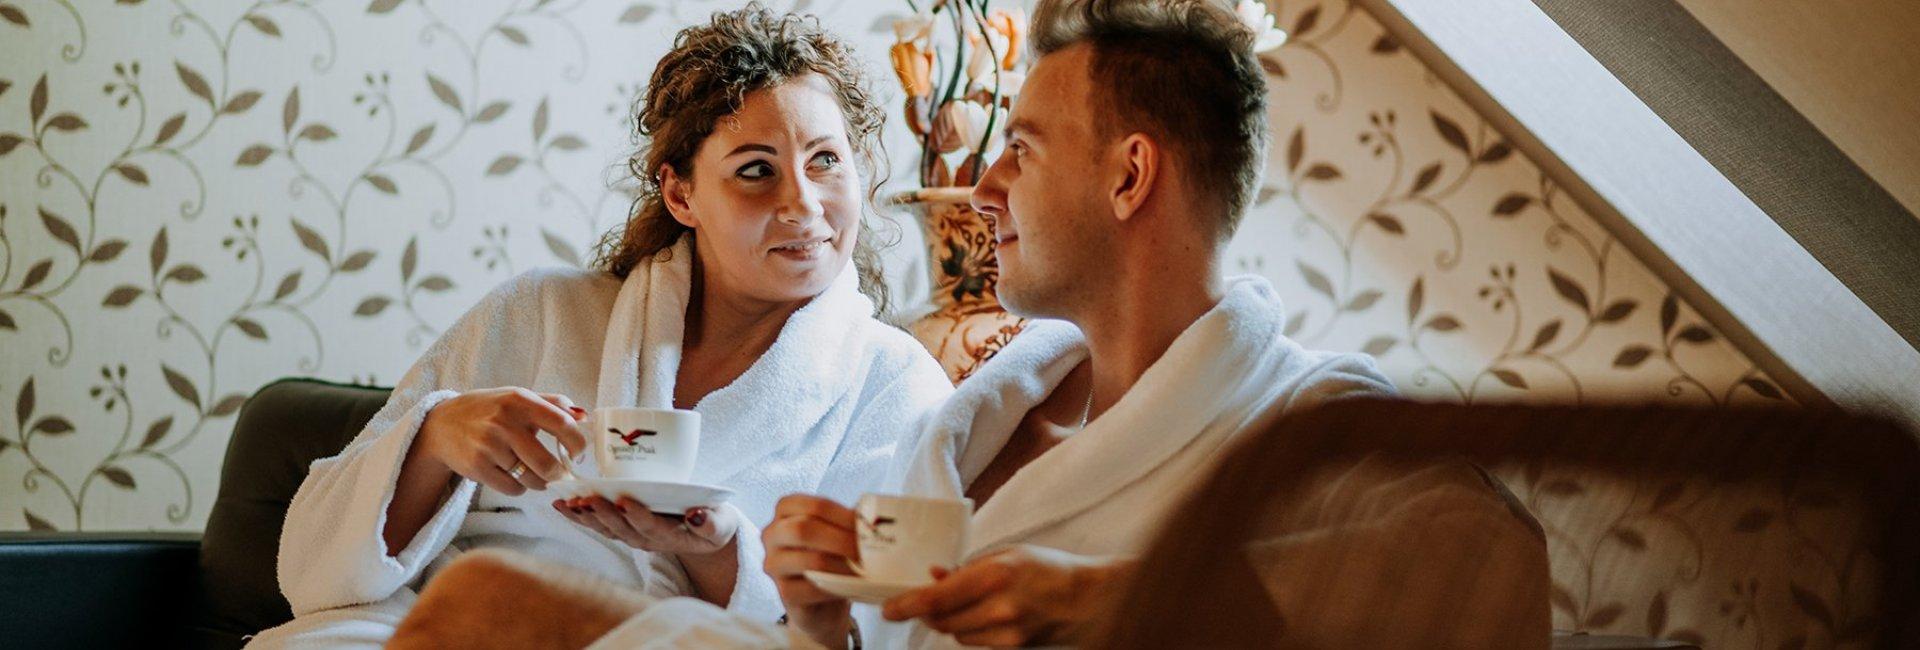 Romantyczny pobyt SPA dla dwojga